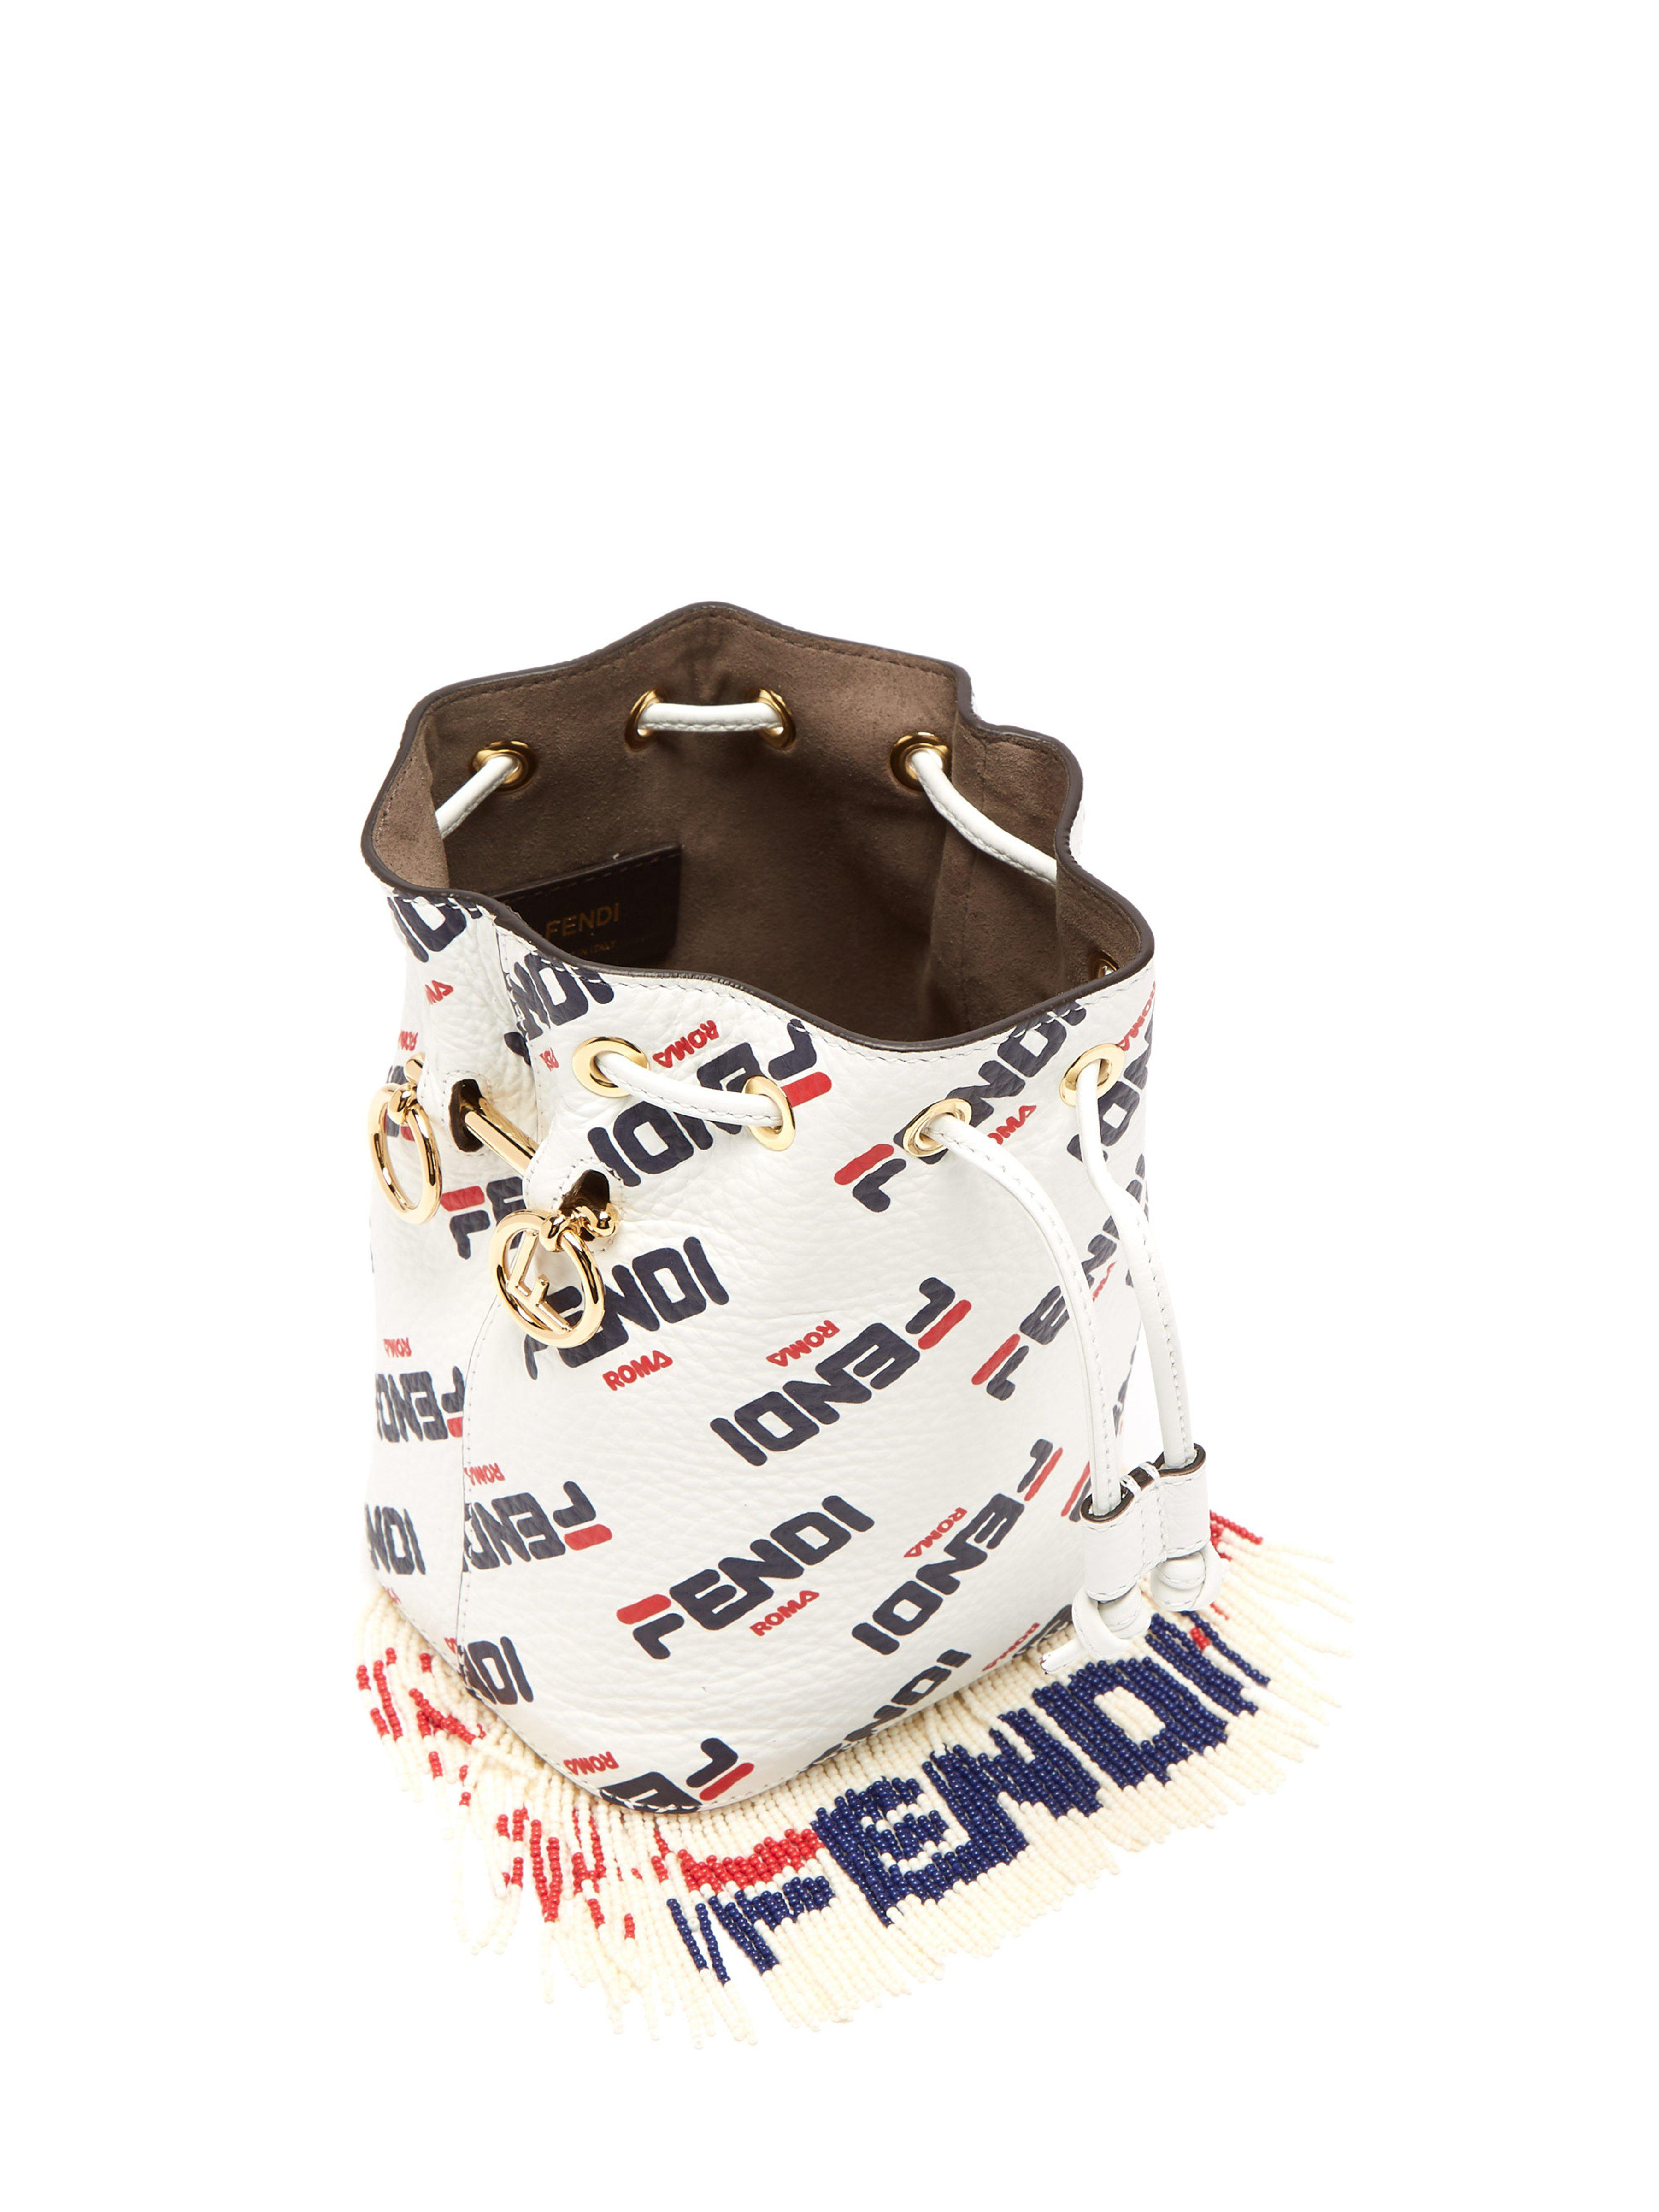 db6268347df4 Fendi - White Mania Mon Tresor Logo Leather Bucket Bag - Lyst. View  fullscreen